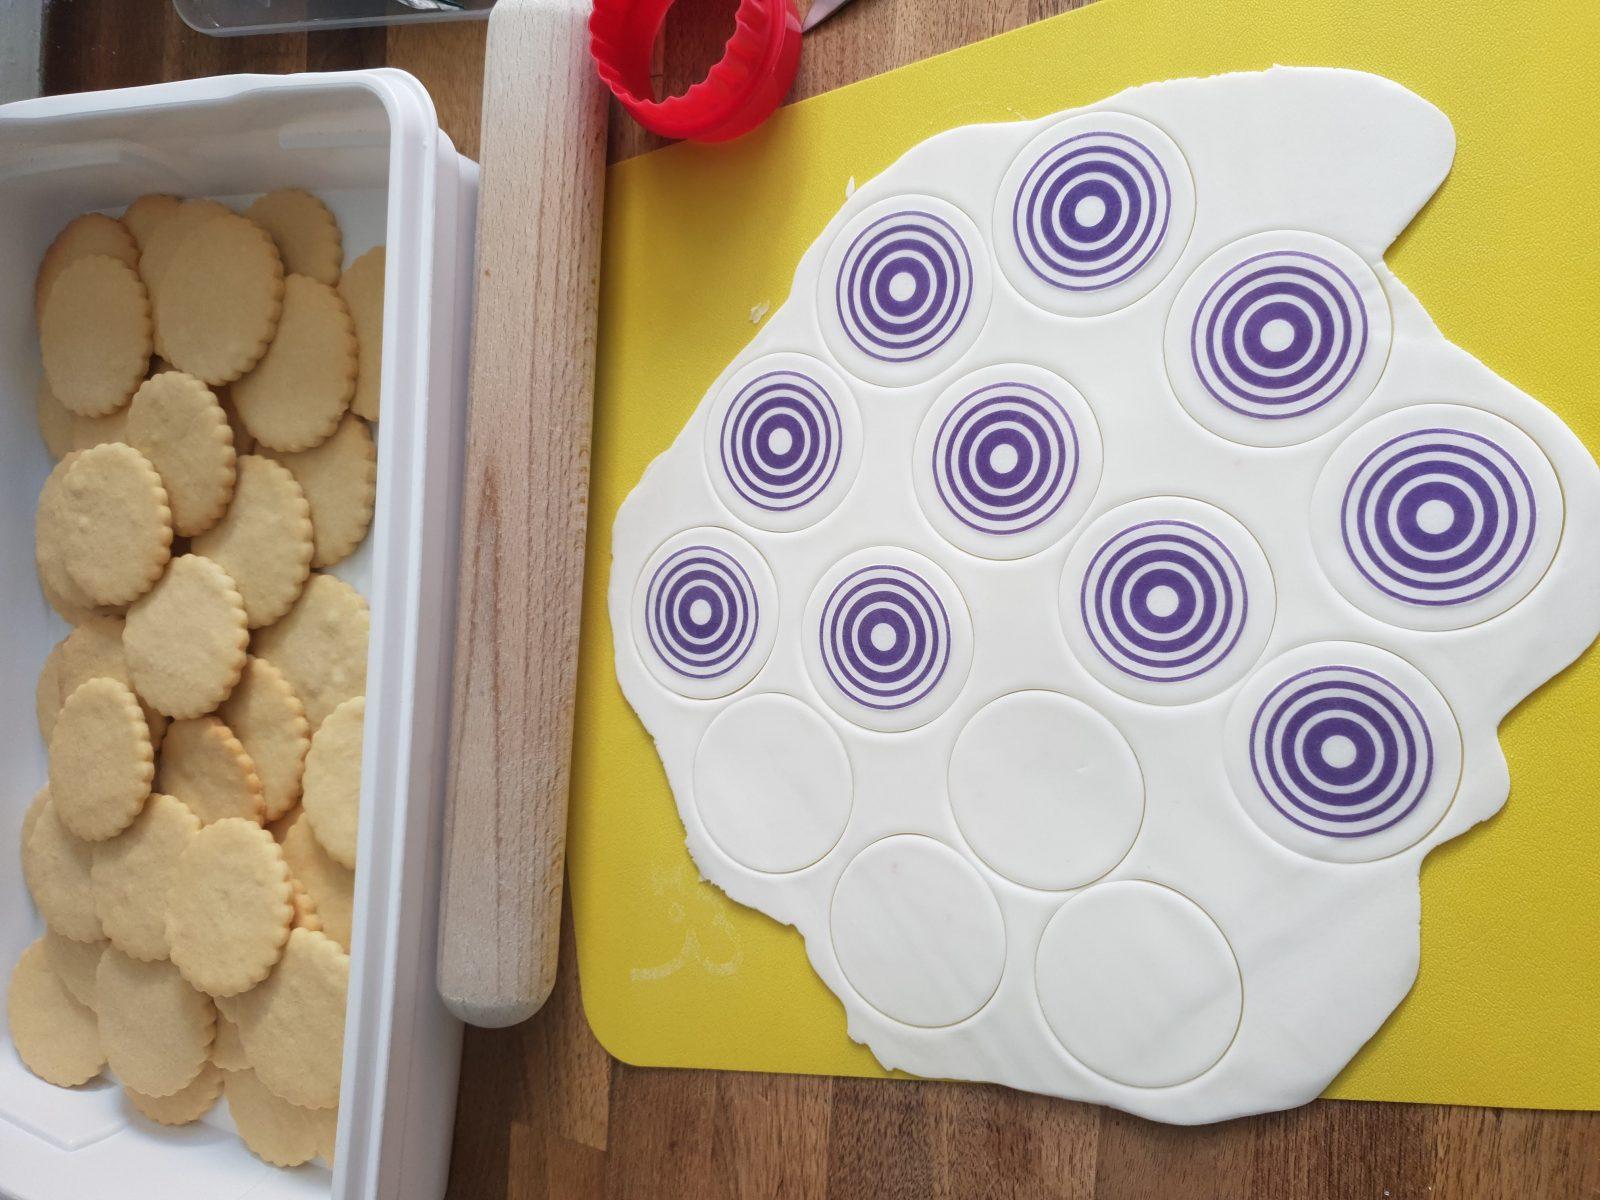 MODO 25 biscuits in preparation | Bloom Bakers